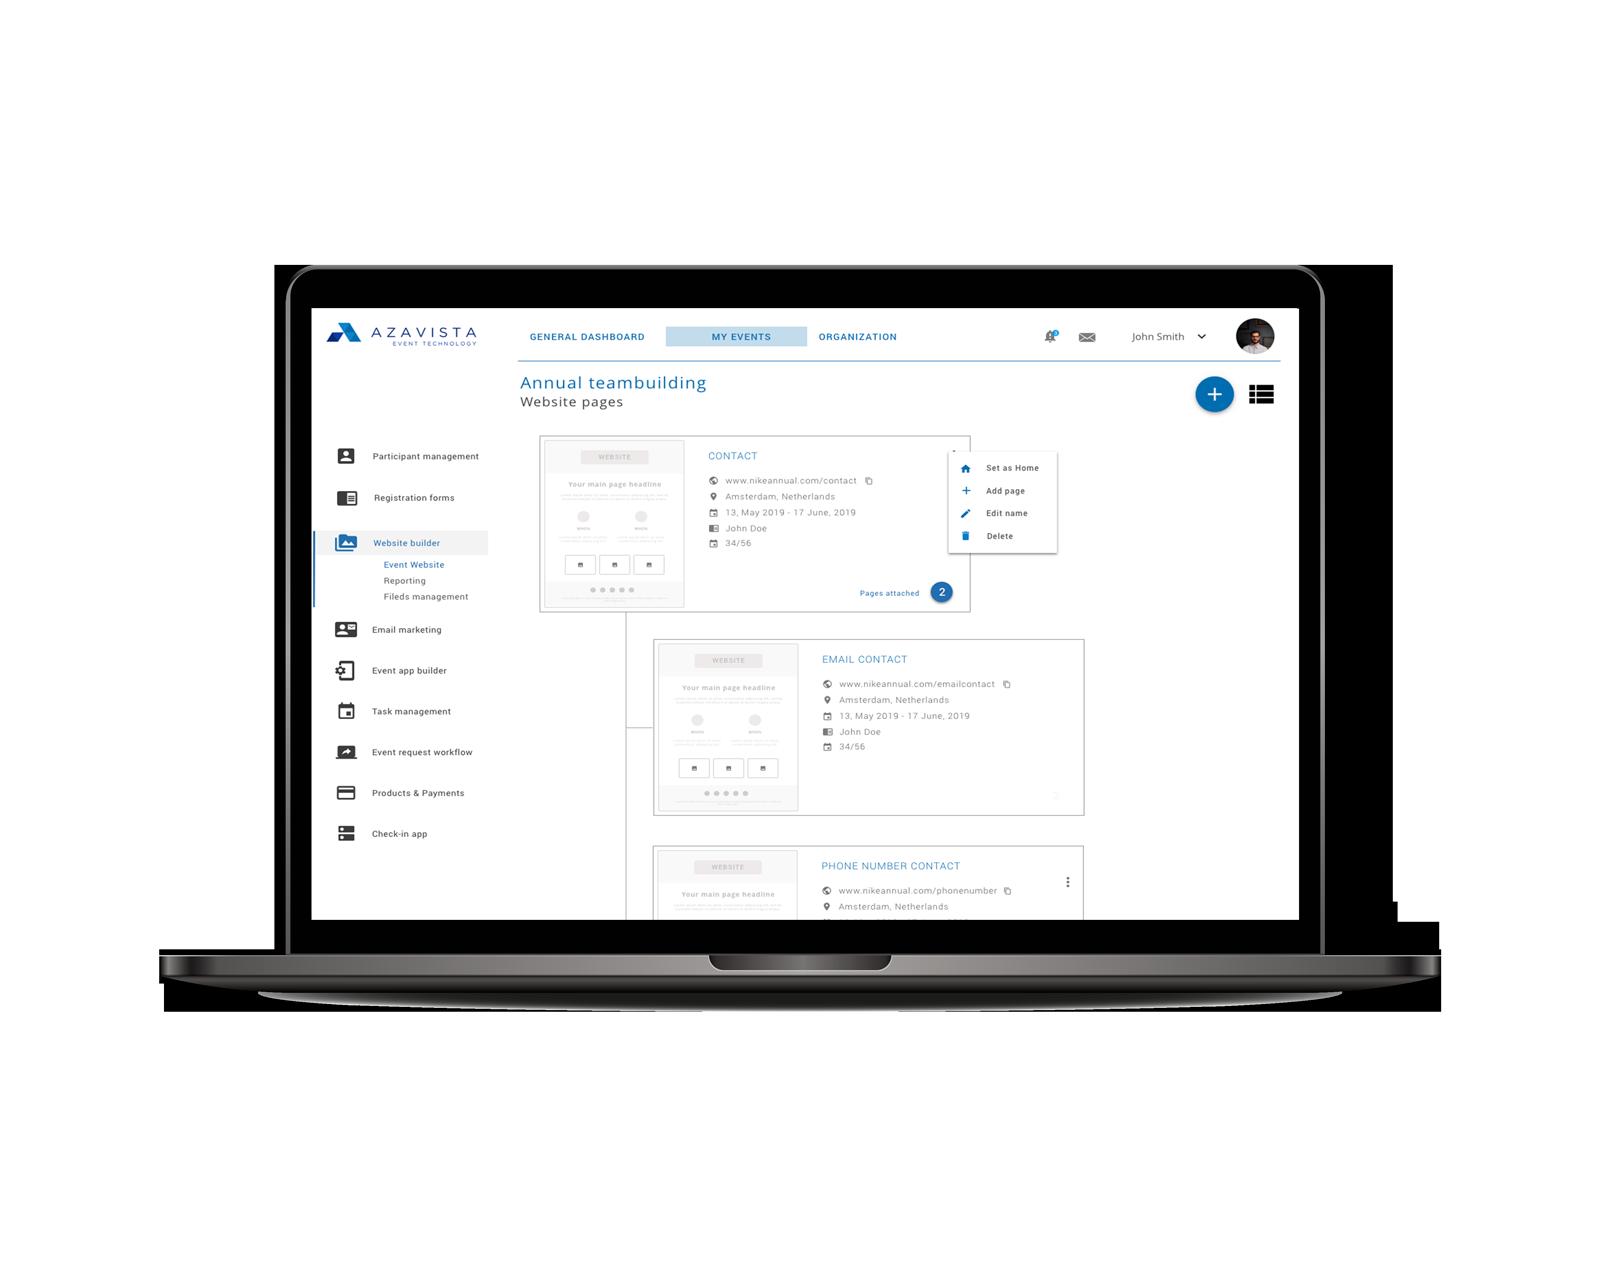 website-content-management-1